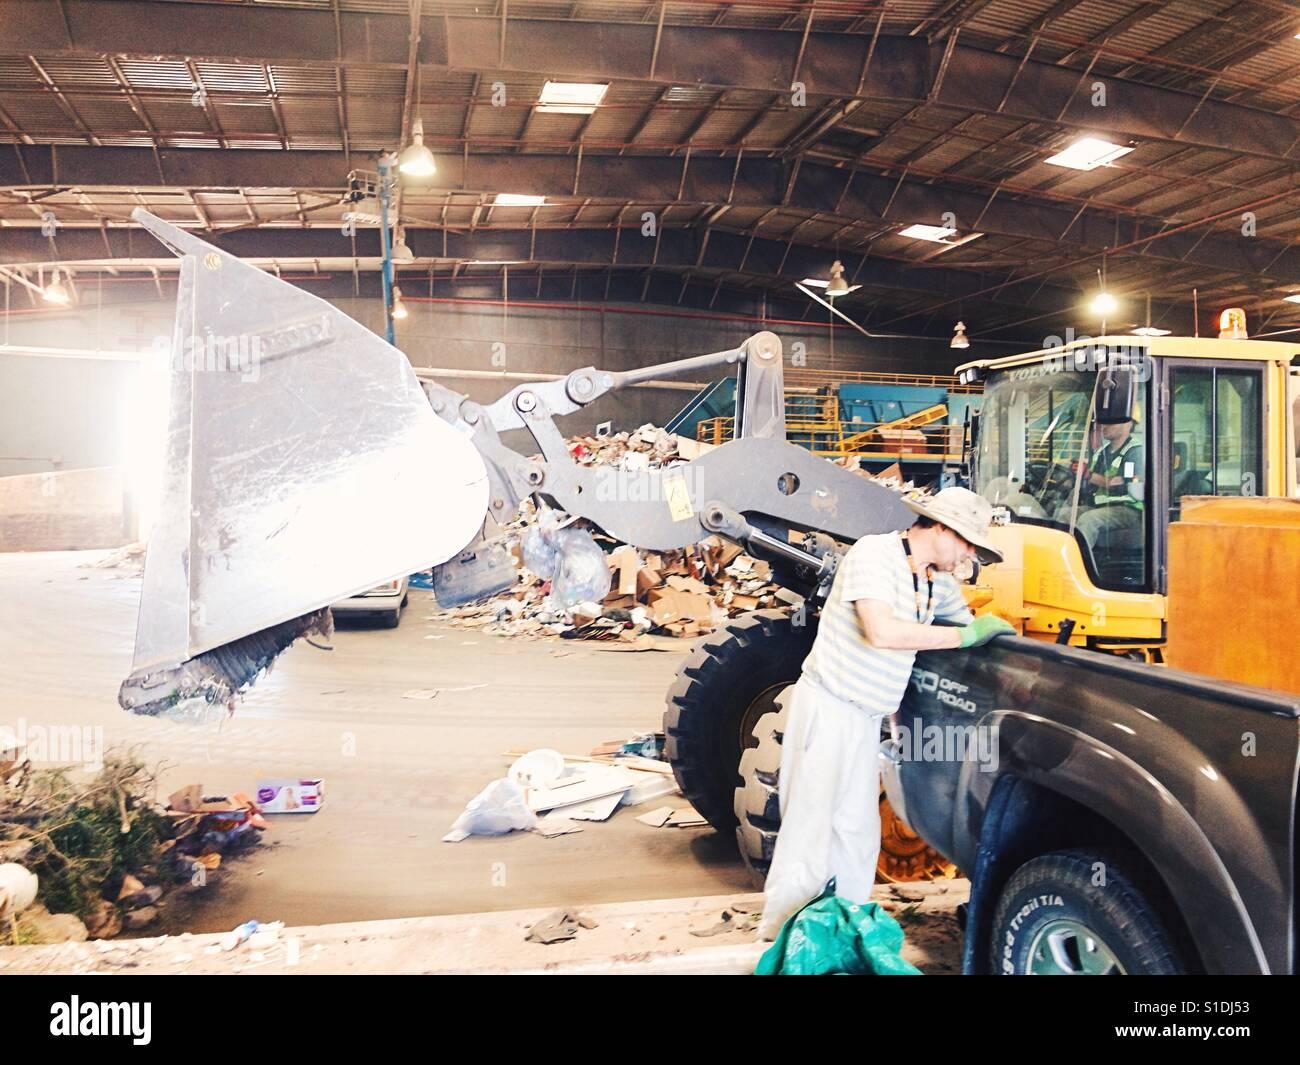 Santa Fe Landfill worker heavy equipment - Stock Image